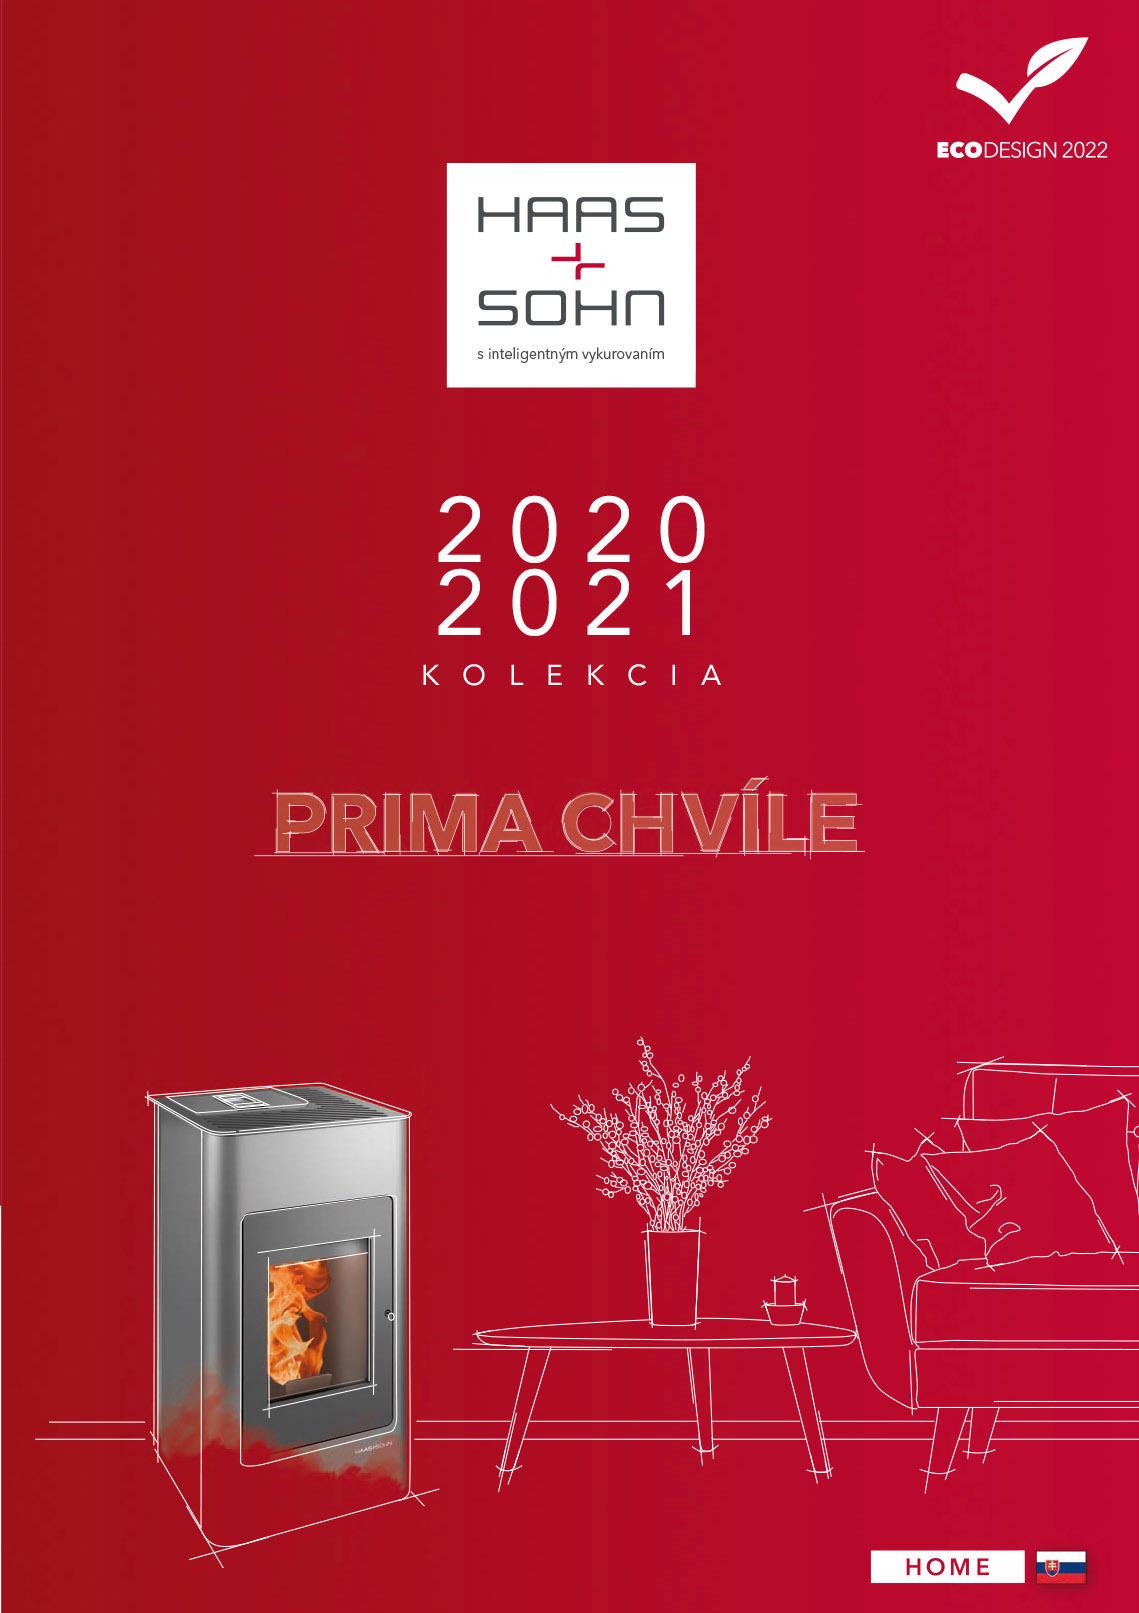 SK_HAAS+SOHN_Home_2020_2021